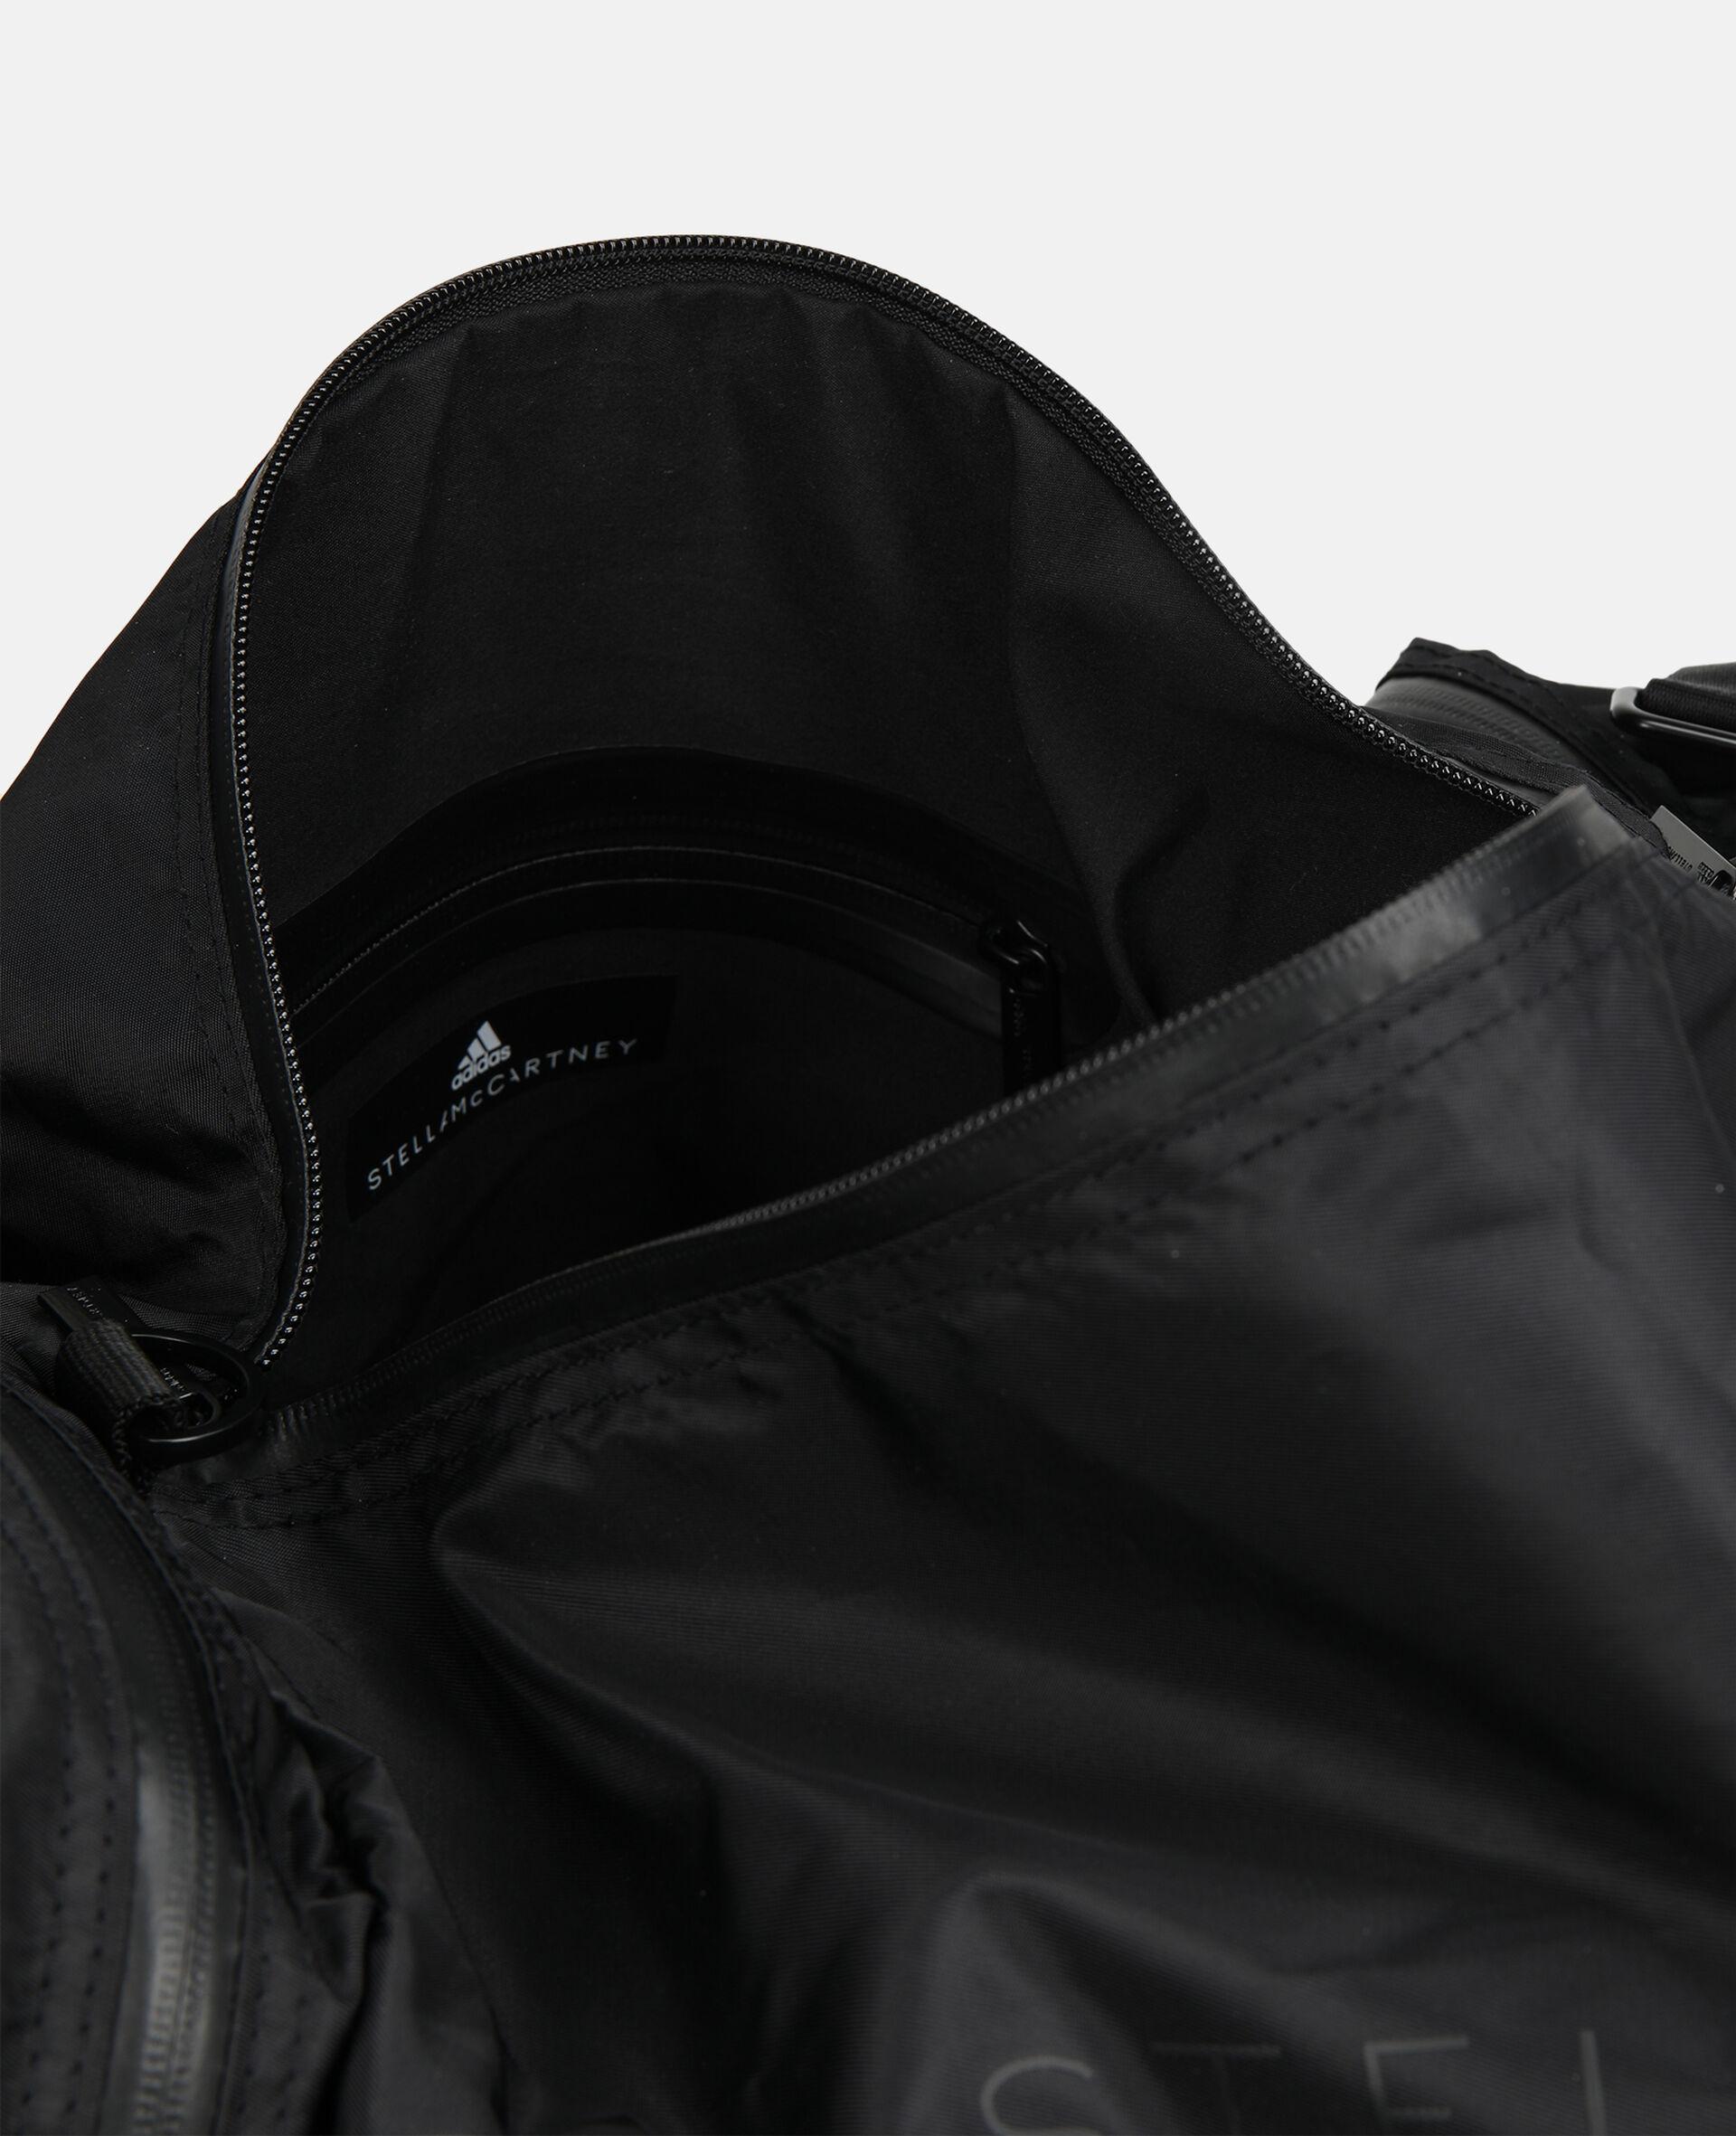 Sac Studiobag carré noir-Noir-large image number 2